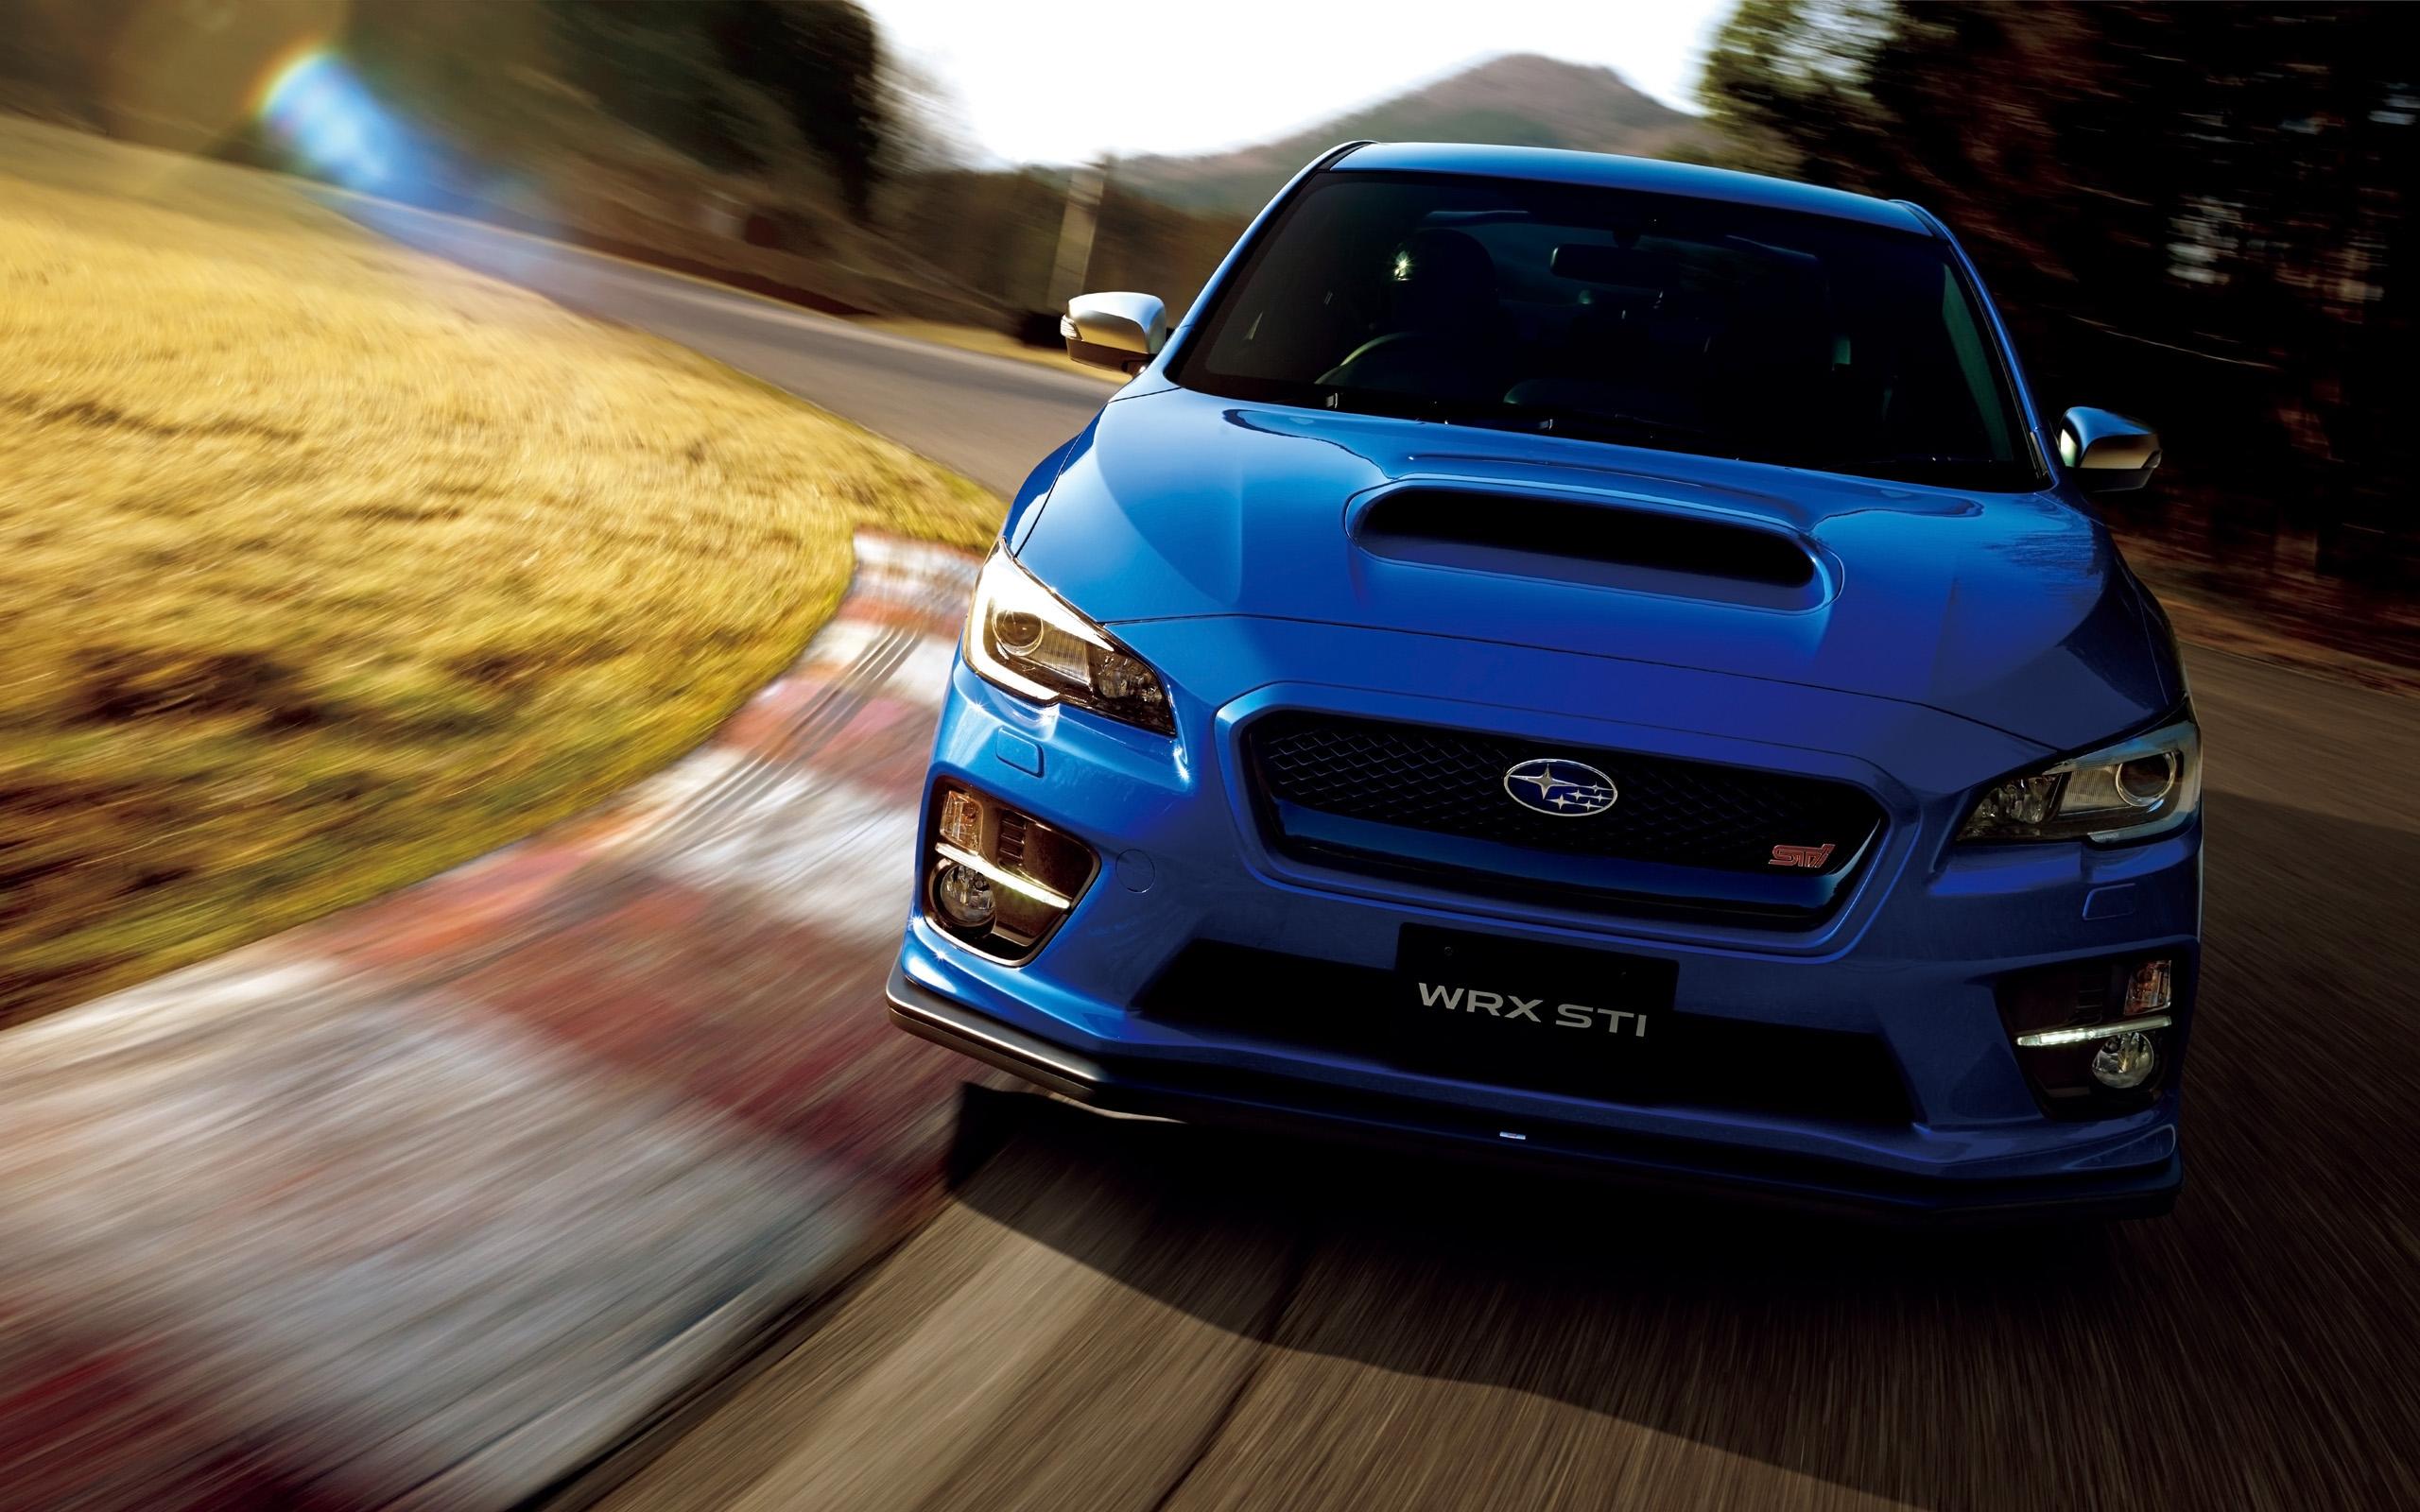 2015 Subaru WRX STI Japan Wallpaper